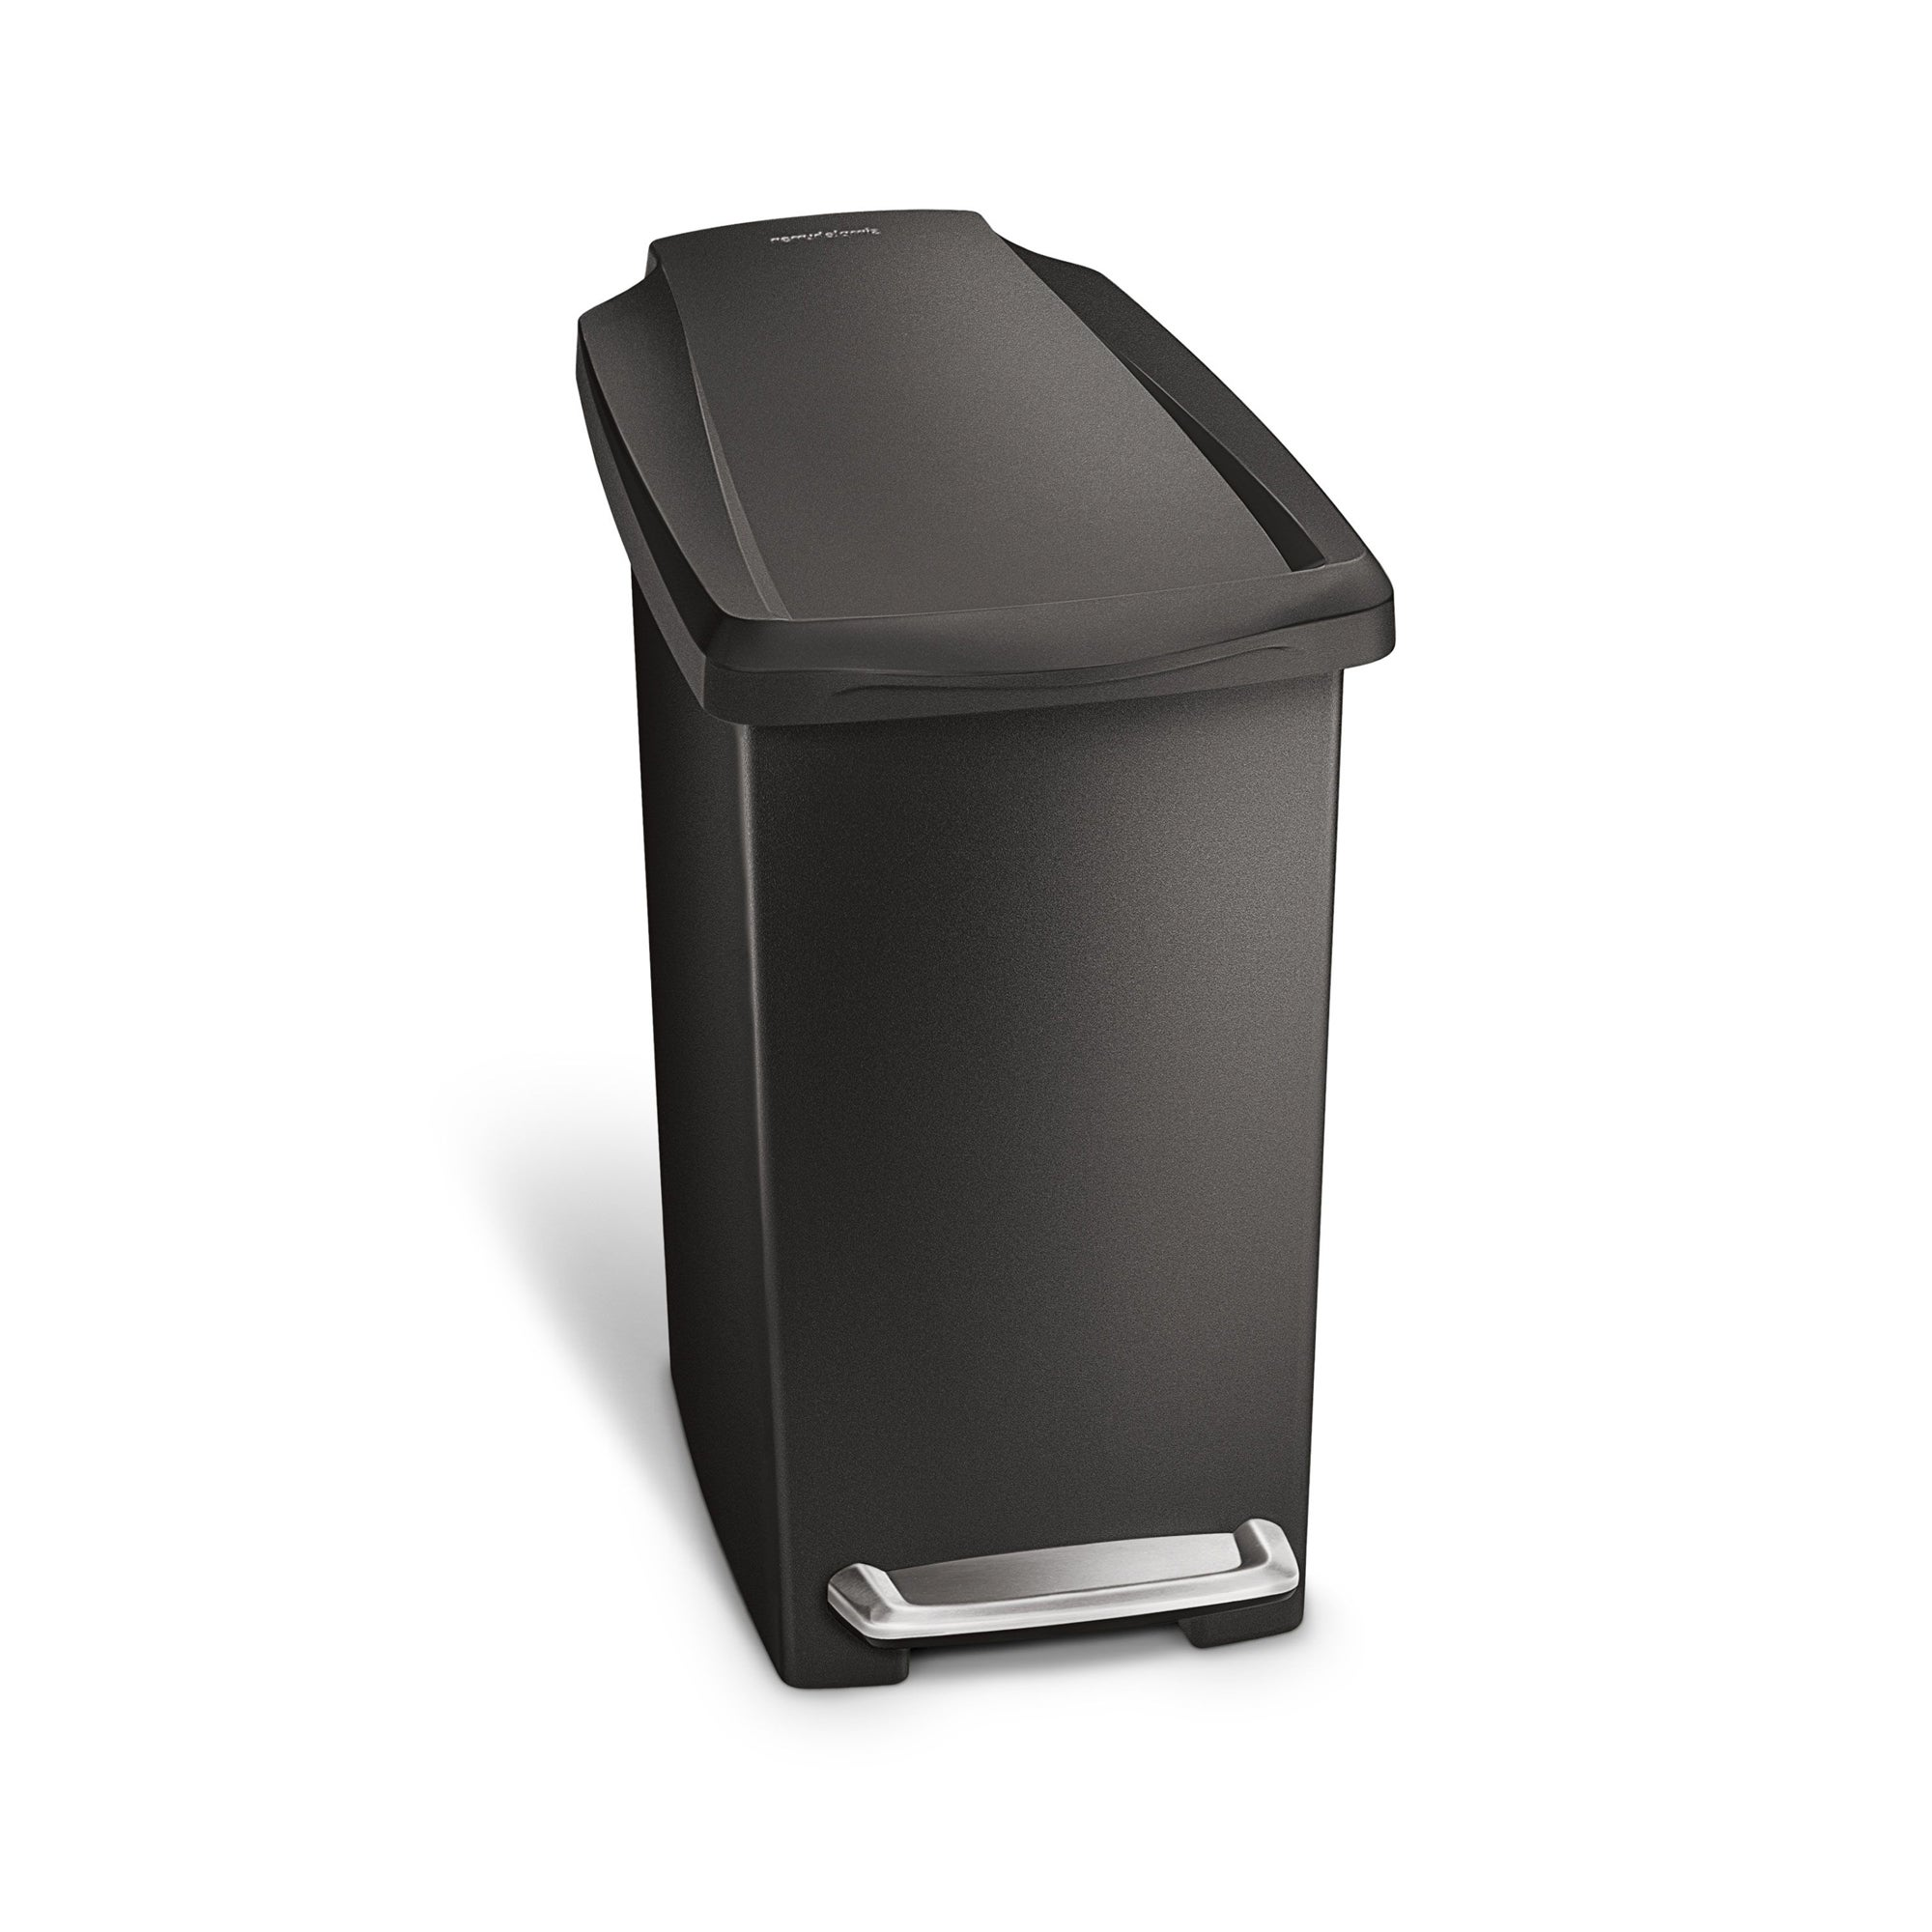 simplehuman 10 Litre Slim Plastic Black Pedal Bin